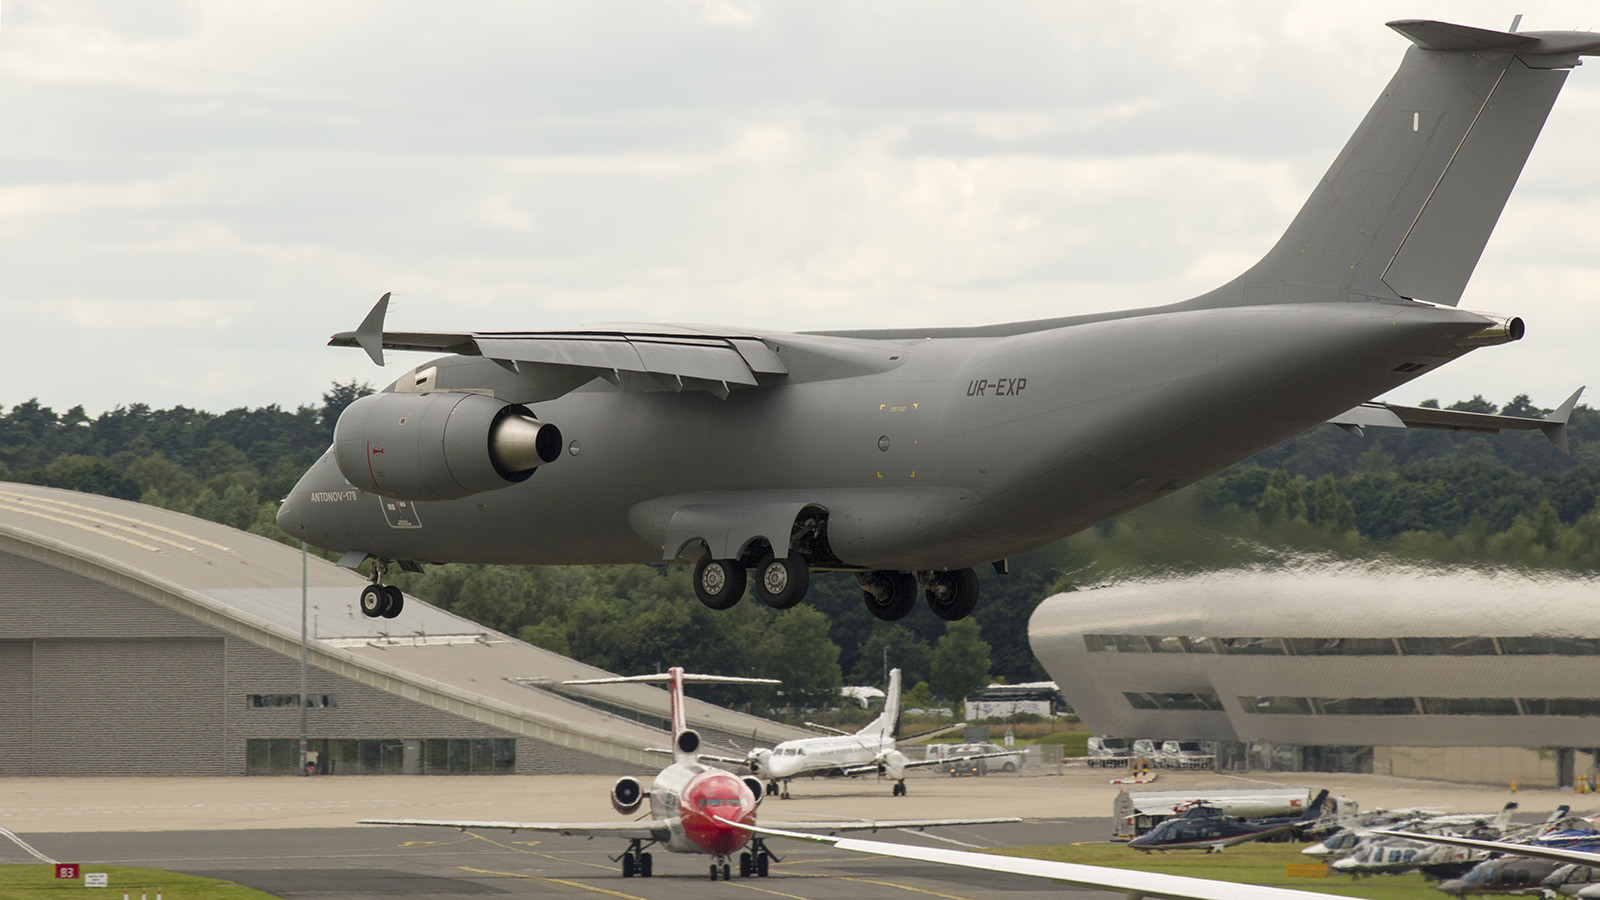 _IMG5927 Antonov An-178 UR-EXP Antonov Design Buro s